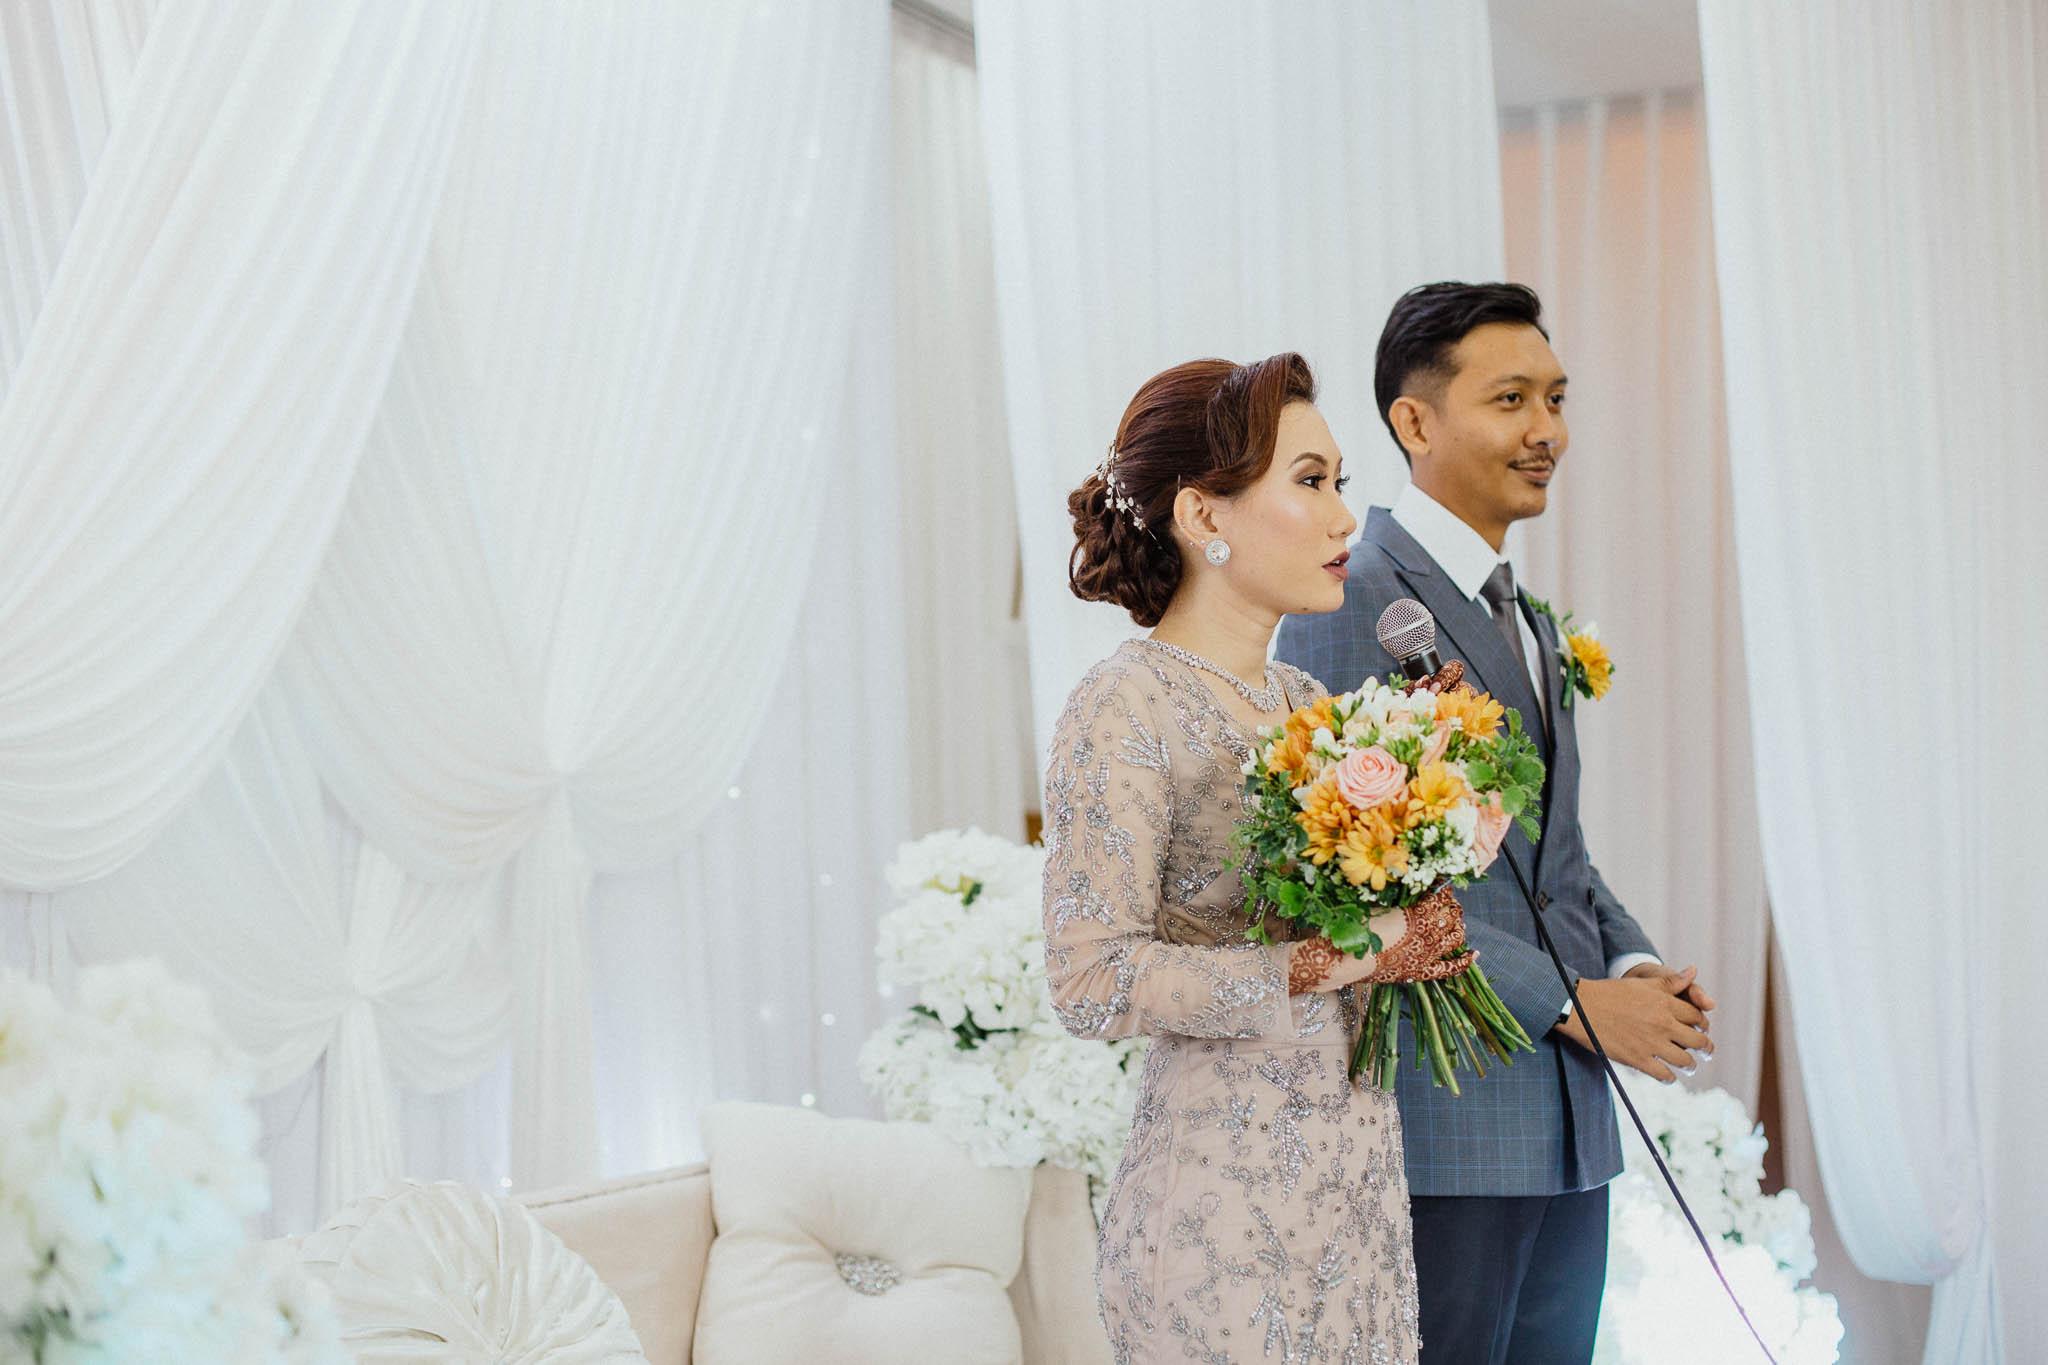 singapore-wedding-photographer-wedding-nufail-addafiq-056.jpg